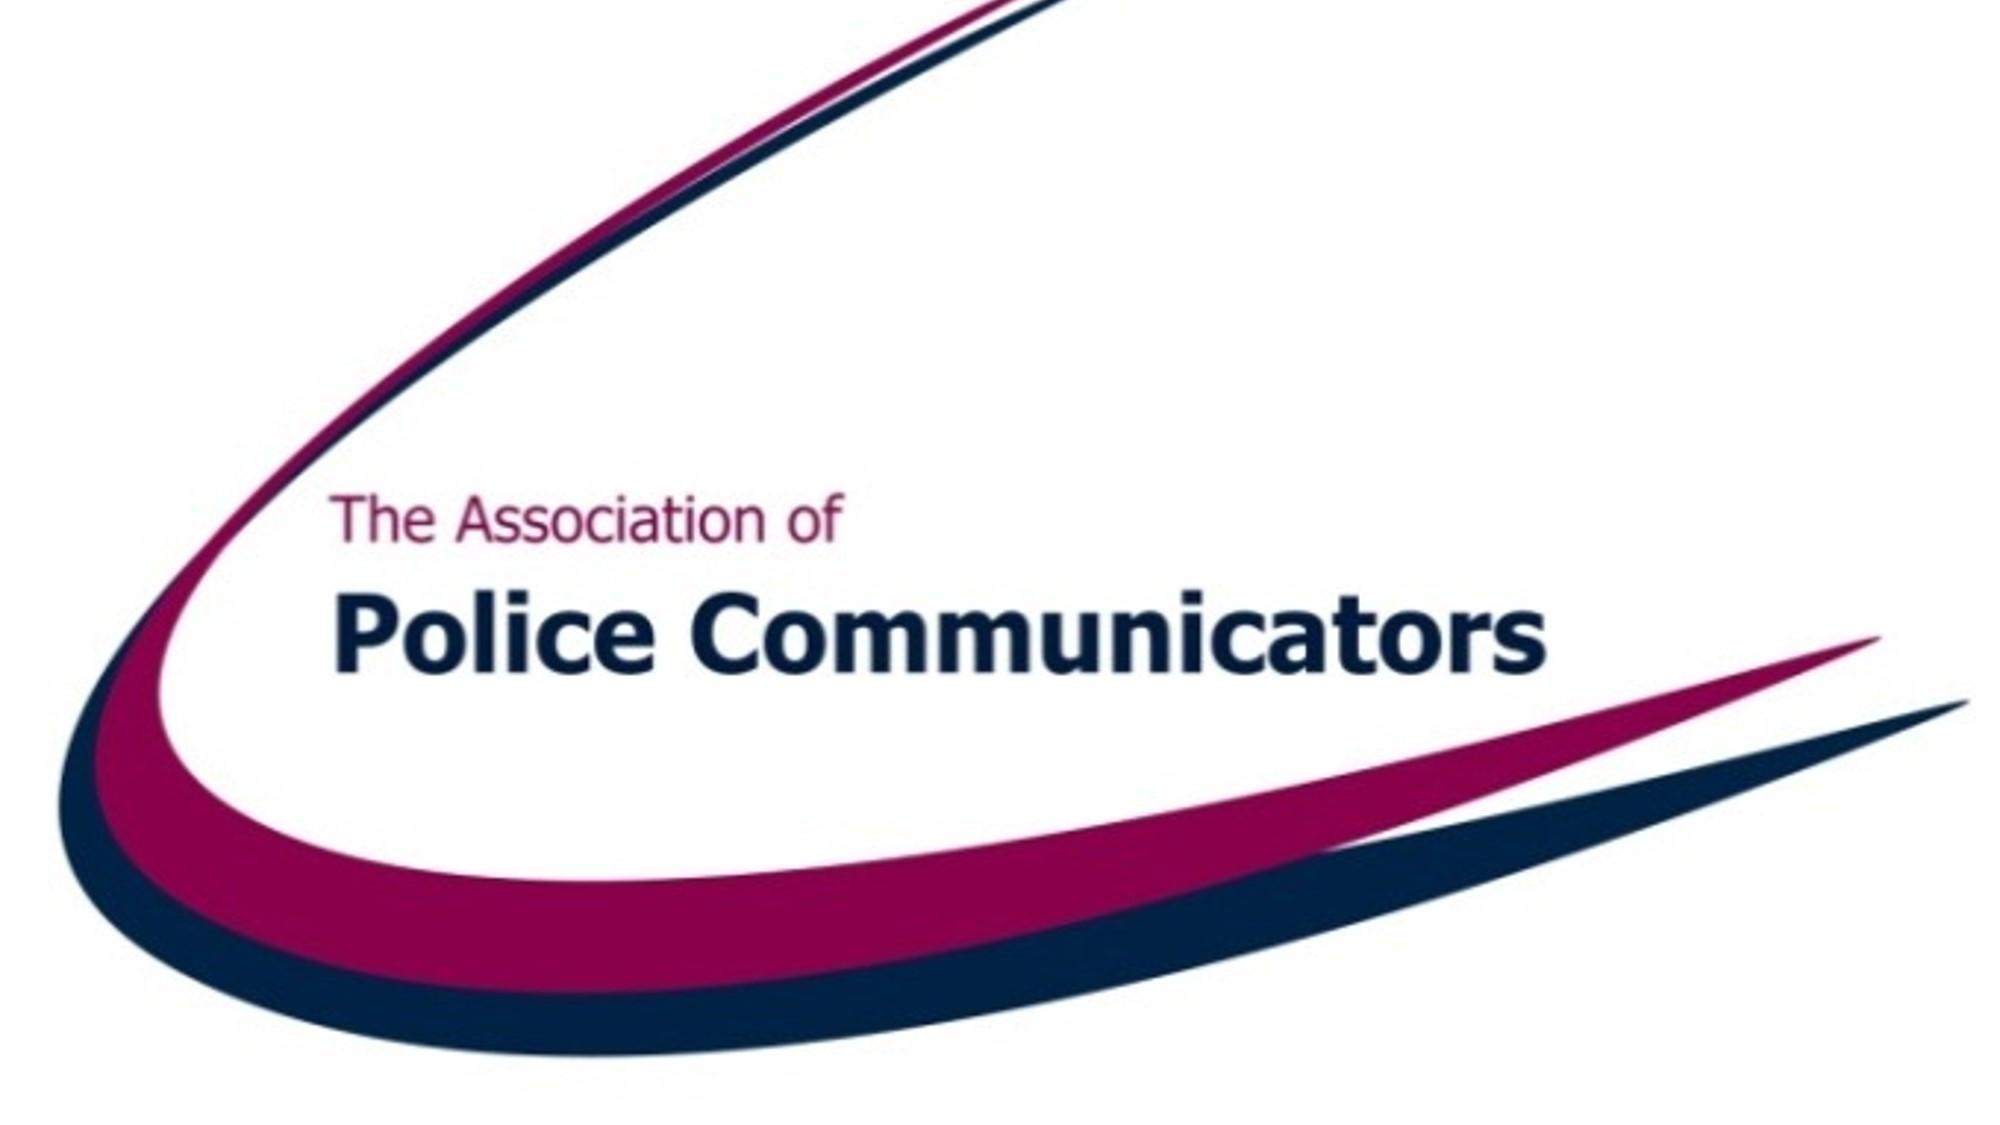 Association of Police Communicators logo